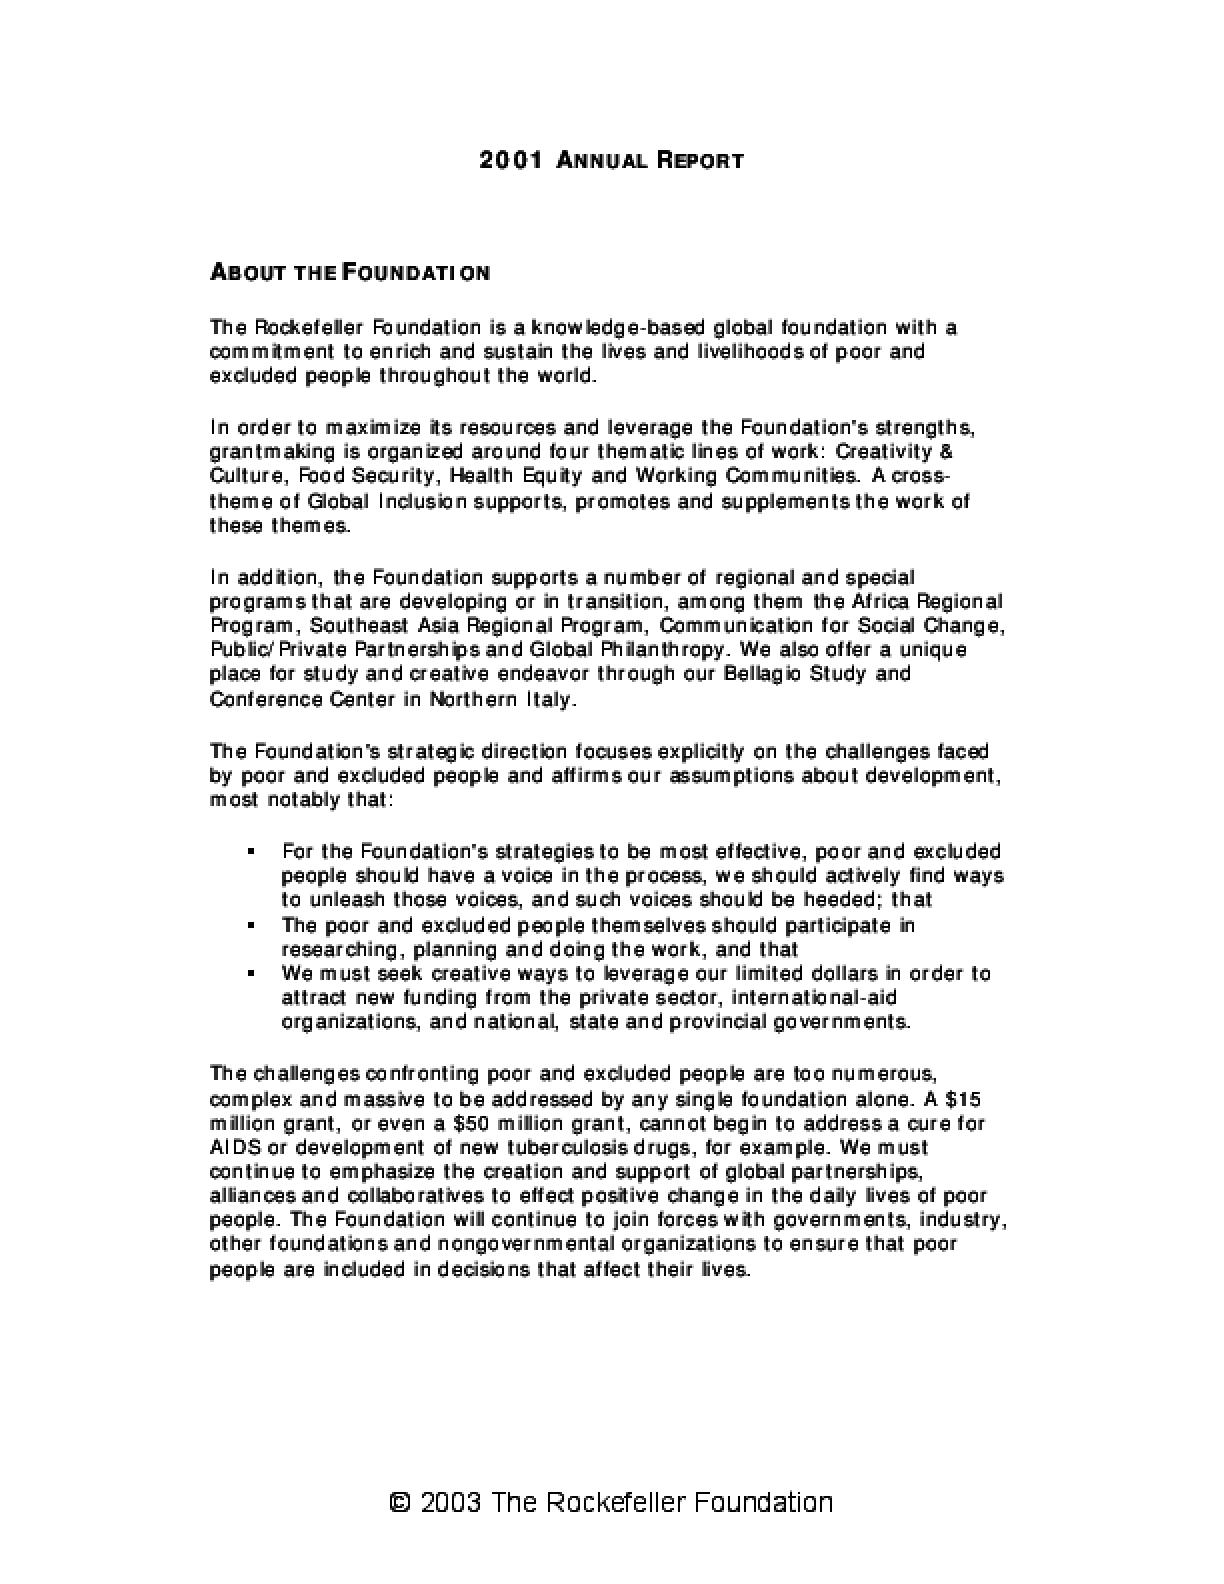 Rockefeller Foundation - 2001 Annual Report